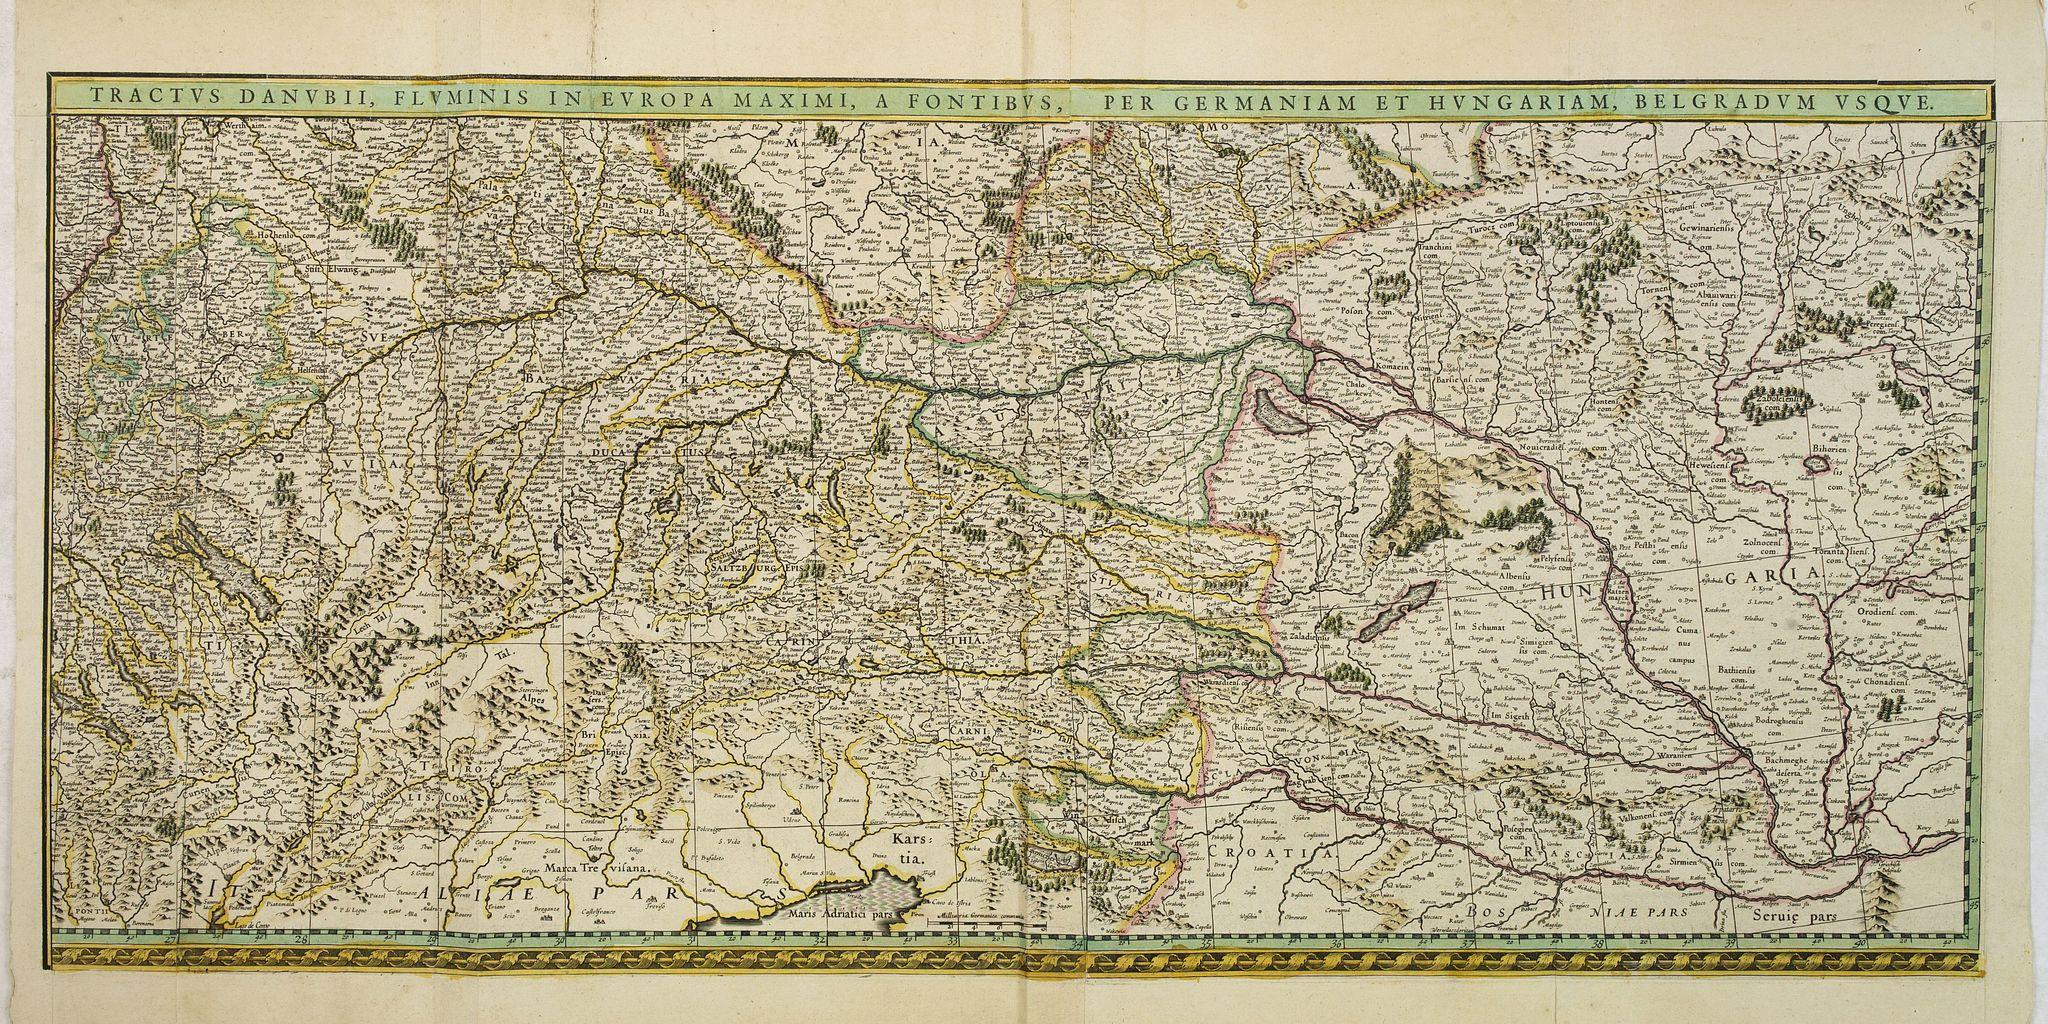 BLAEU, W. -  Tractus Danubii, Fluminis in Europa Maximi, A Fontibus, Per Germaniam. . .